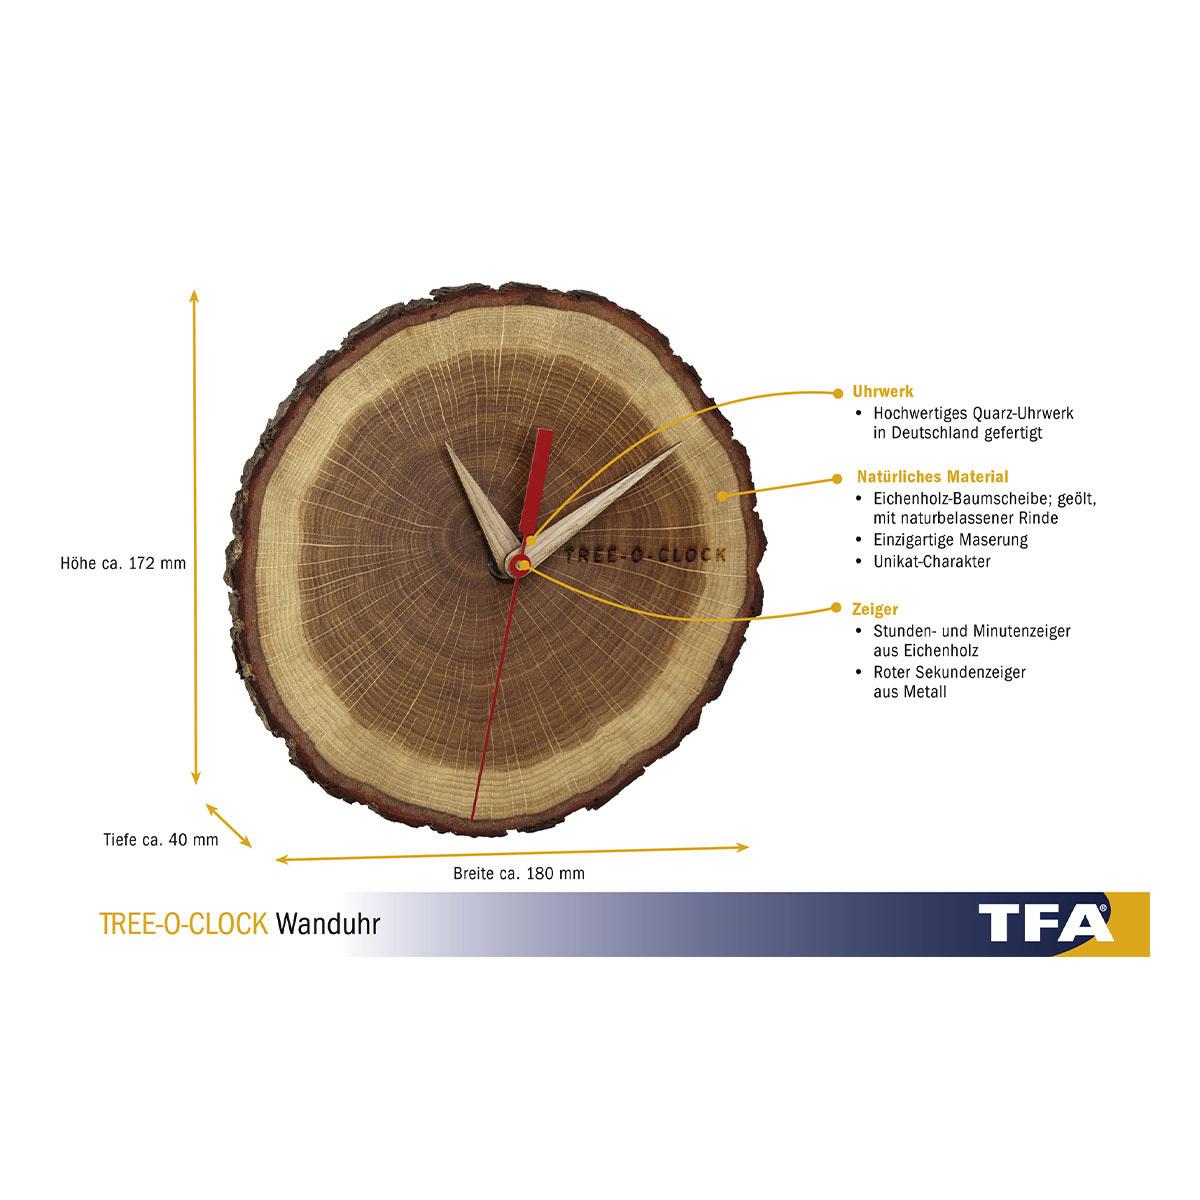 60-3046-08-analoge-wanduhr-eichenholz-tree-o-clock-abmessungen-1200x1200px.jpg